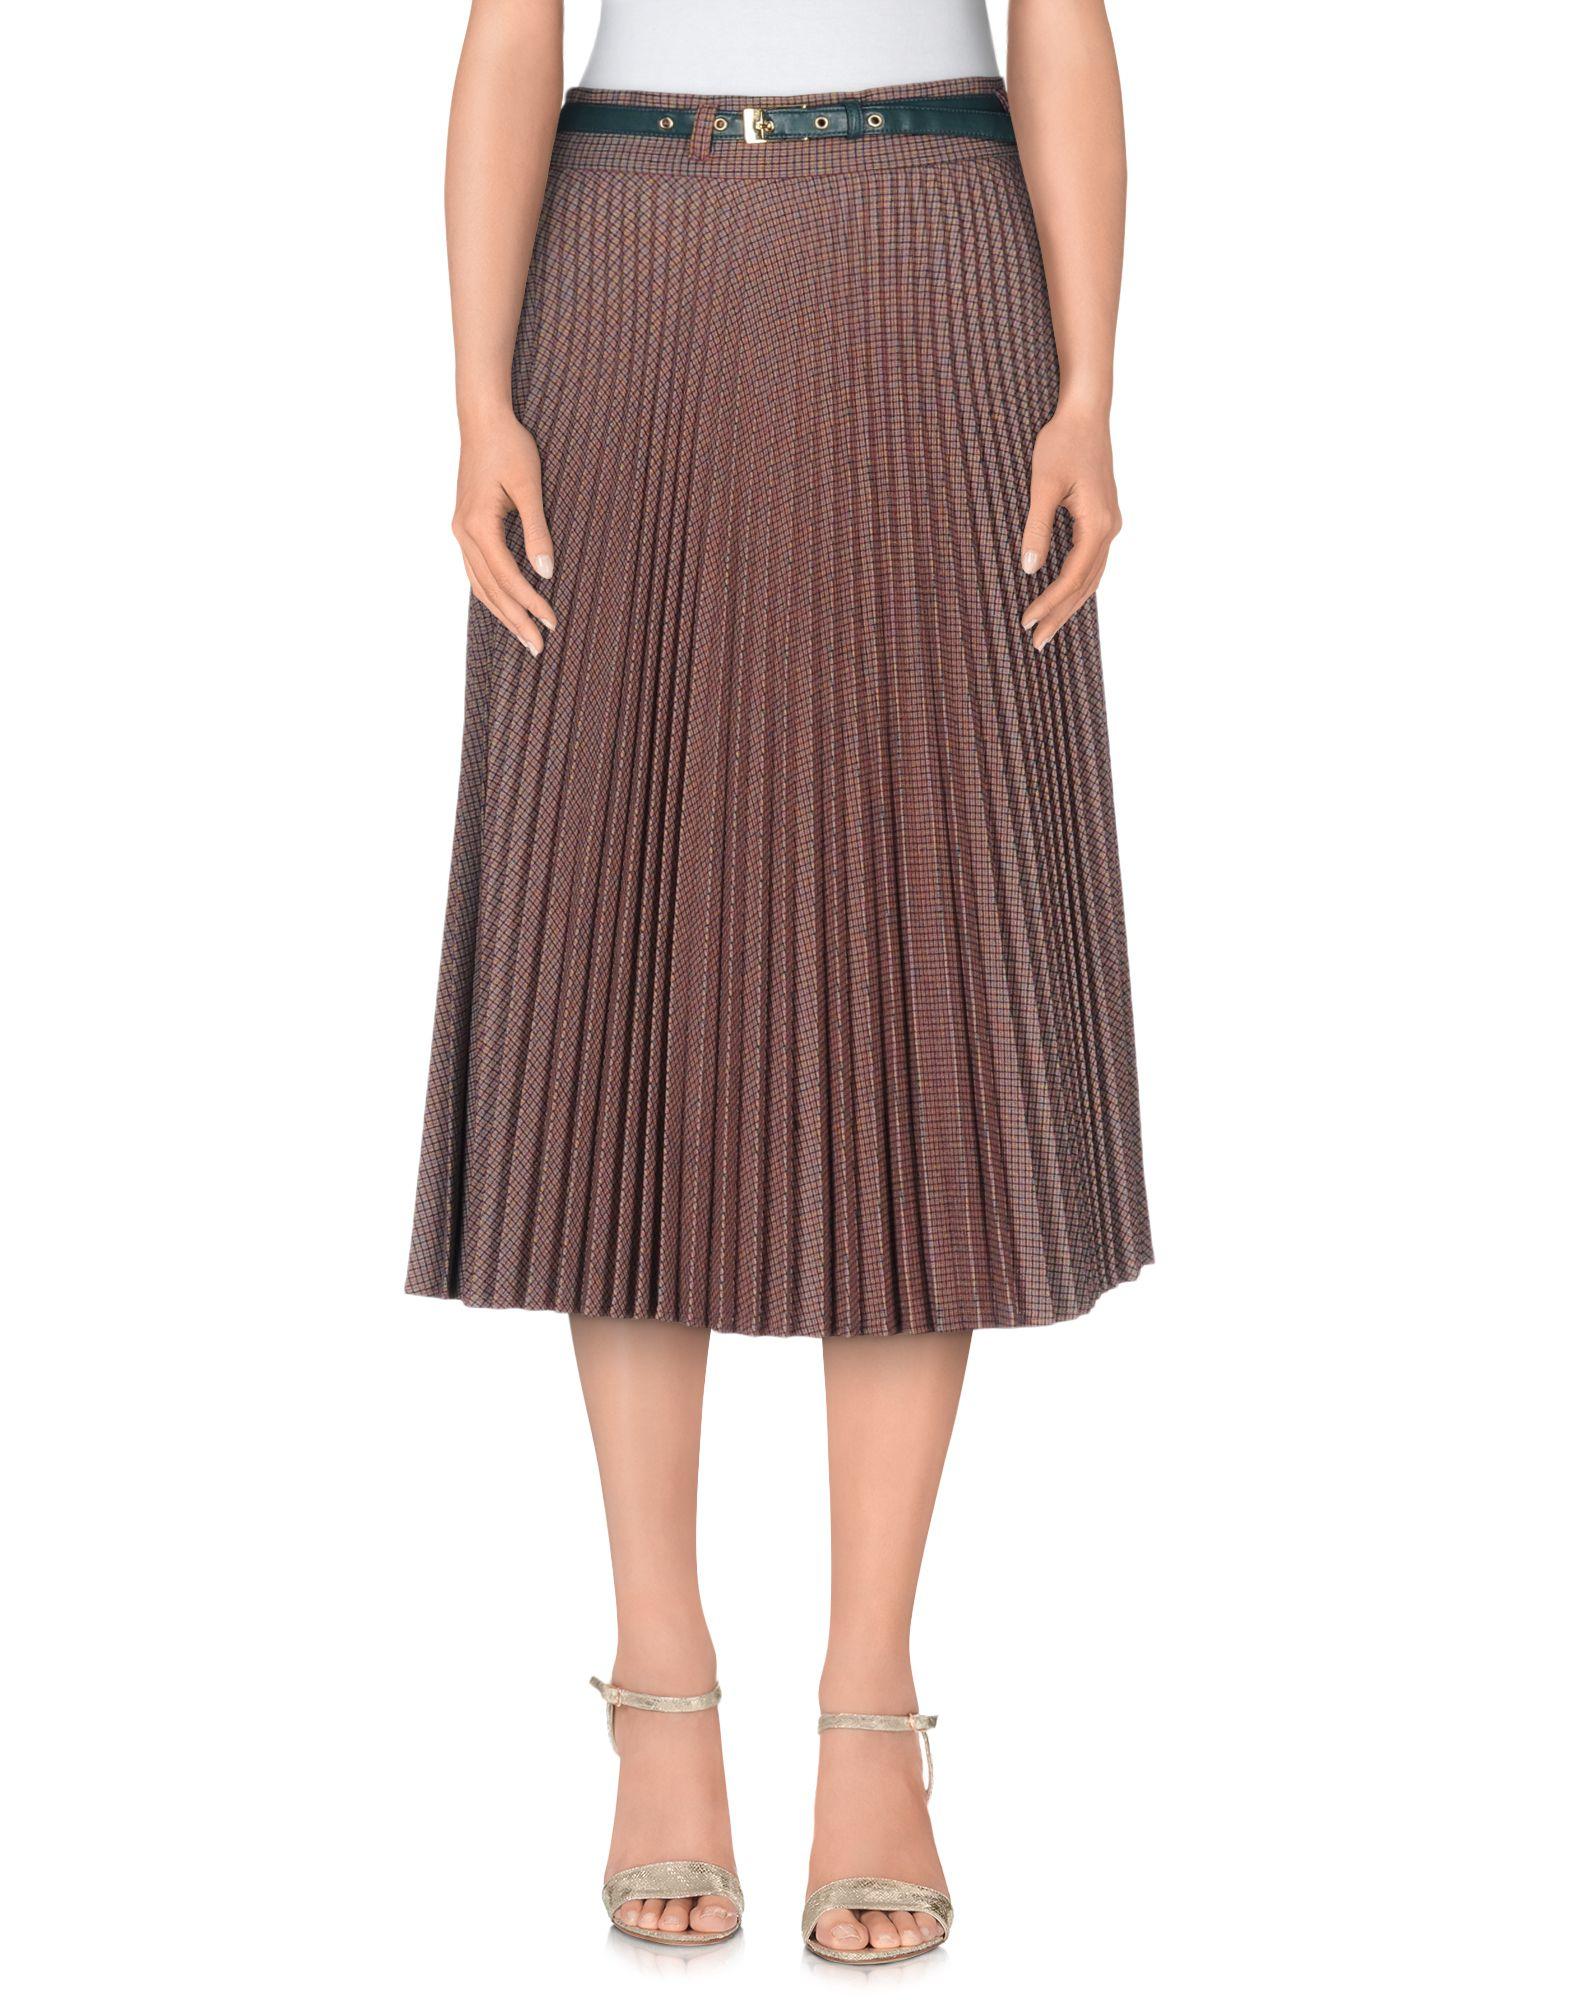 Lyst Mariagrazia Panizzi 3 4 Length Skirt In Brown